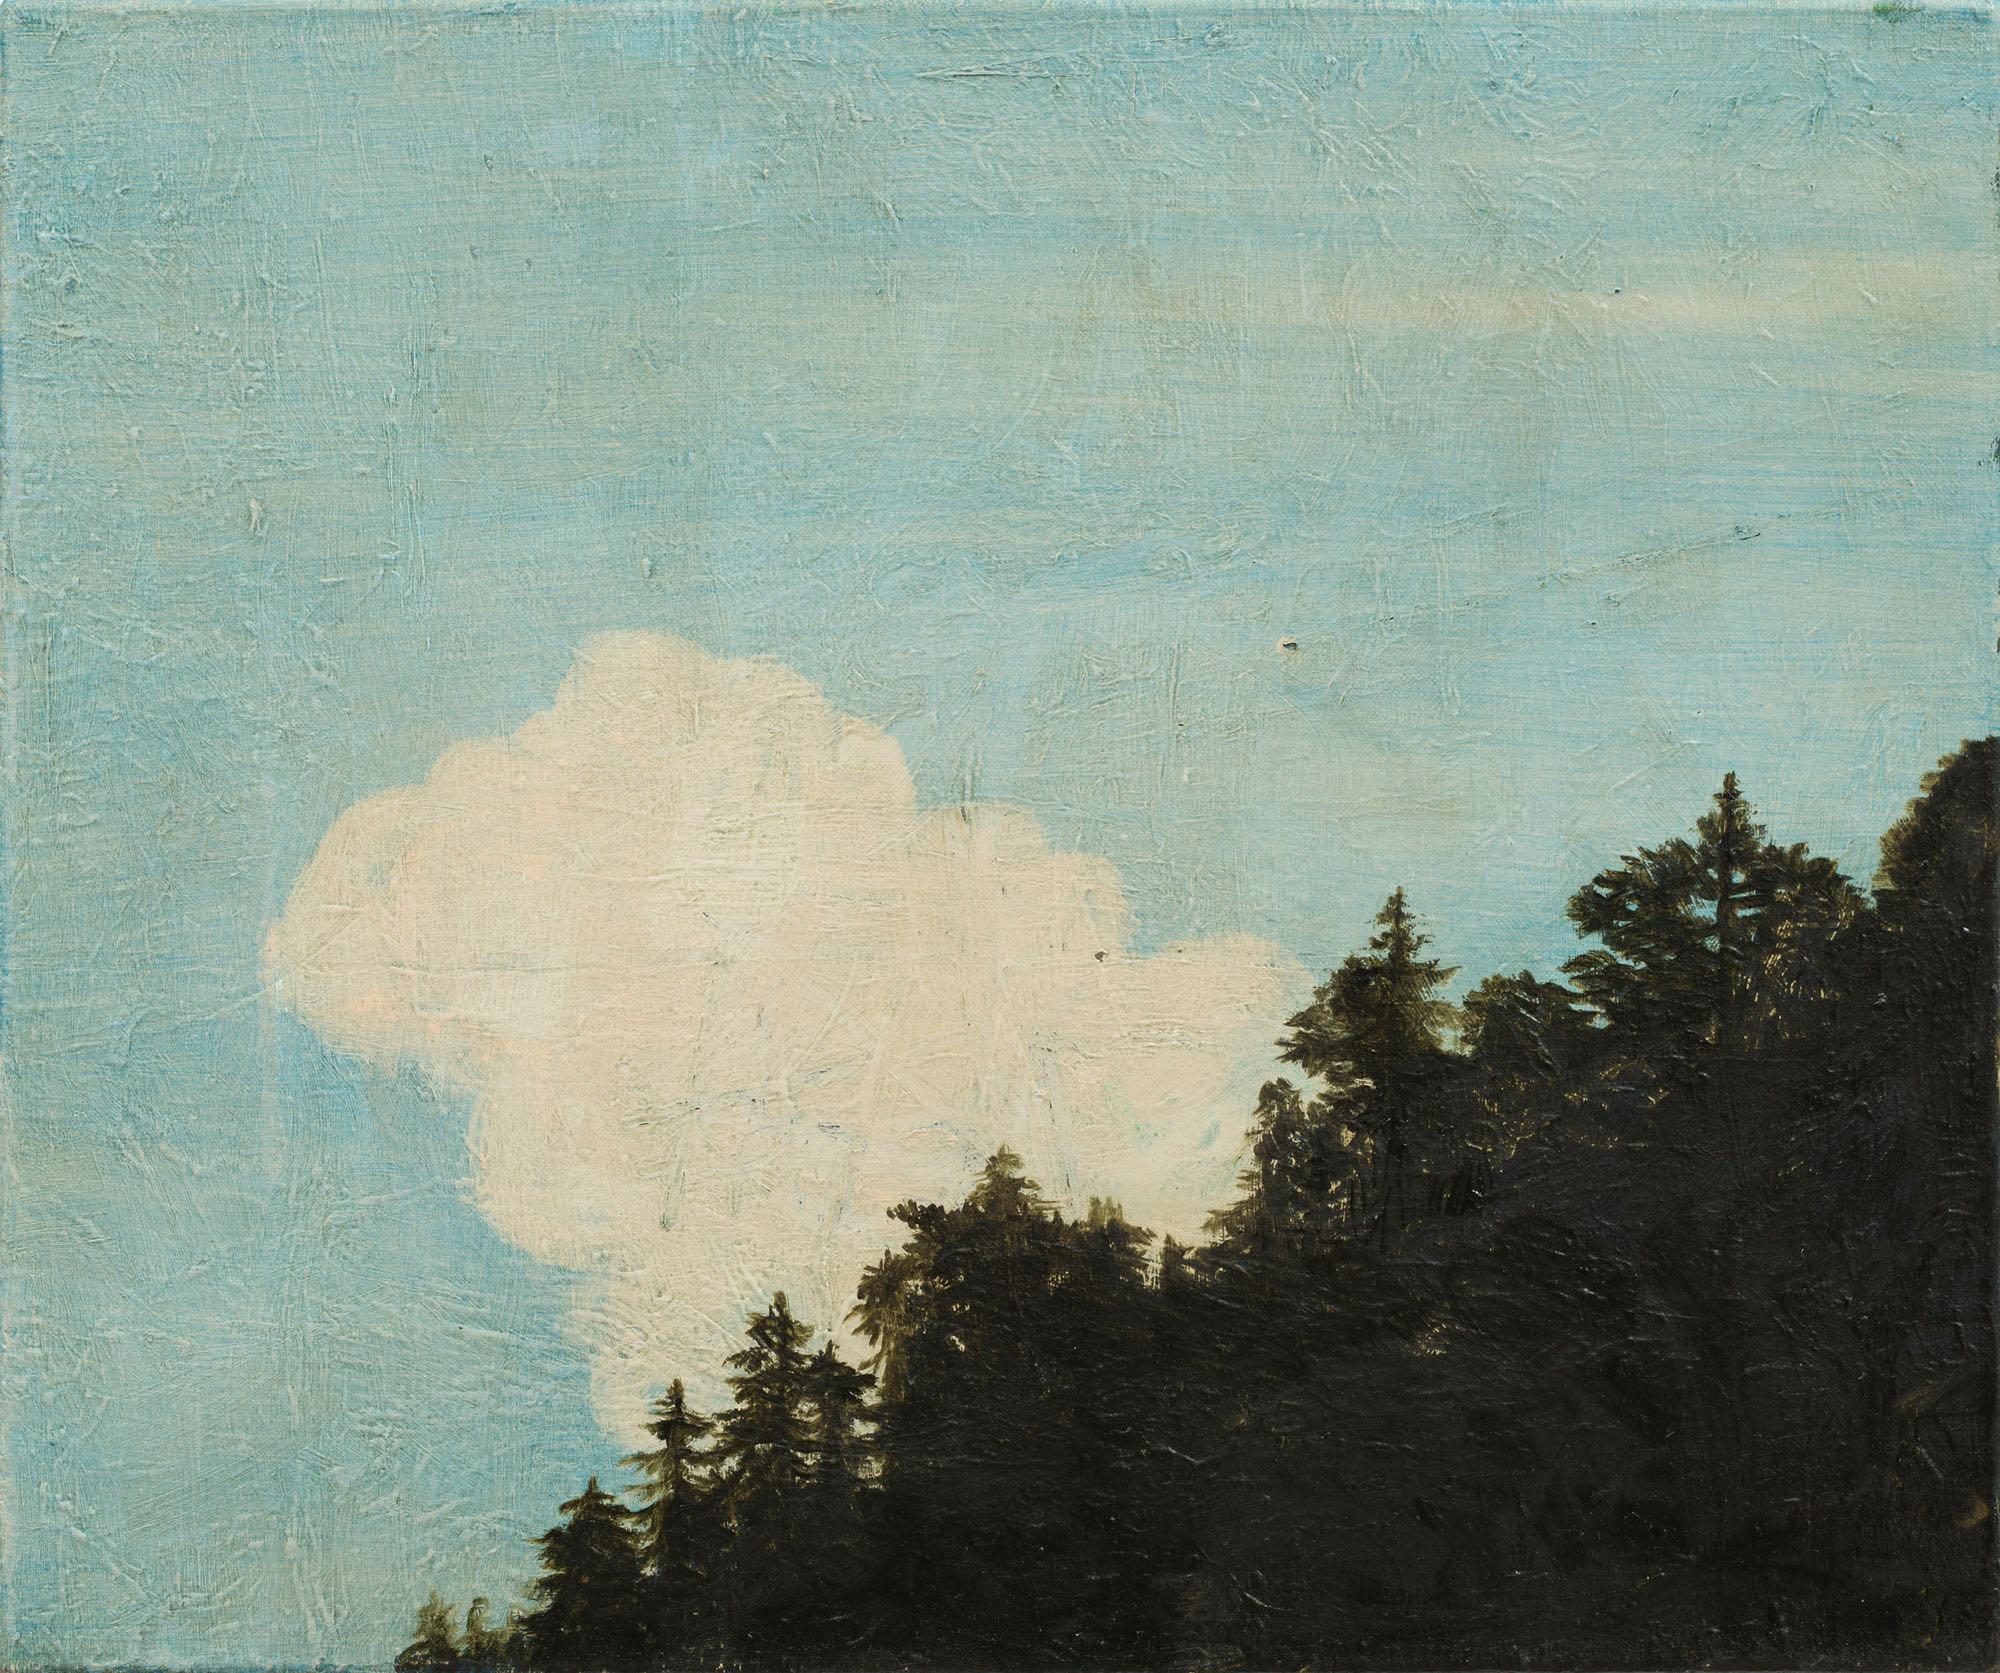 Hvit sky over treranden  31x37 cm opl 2015